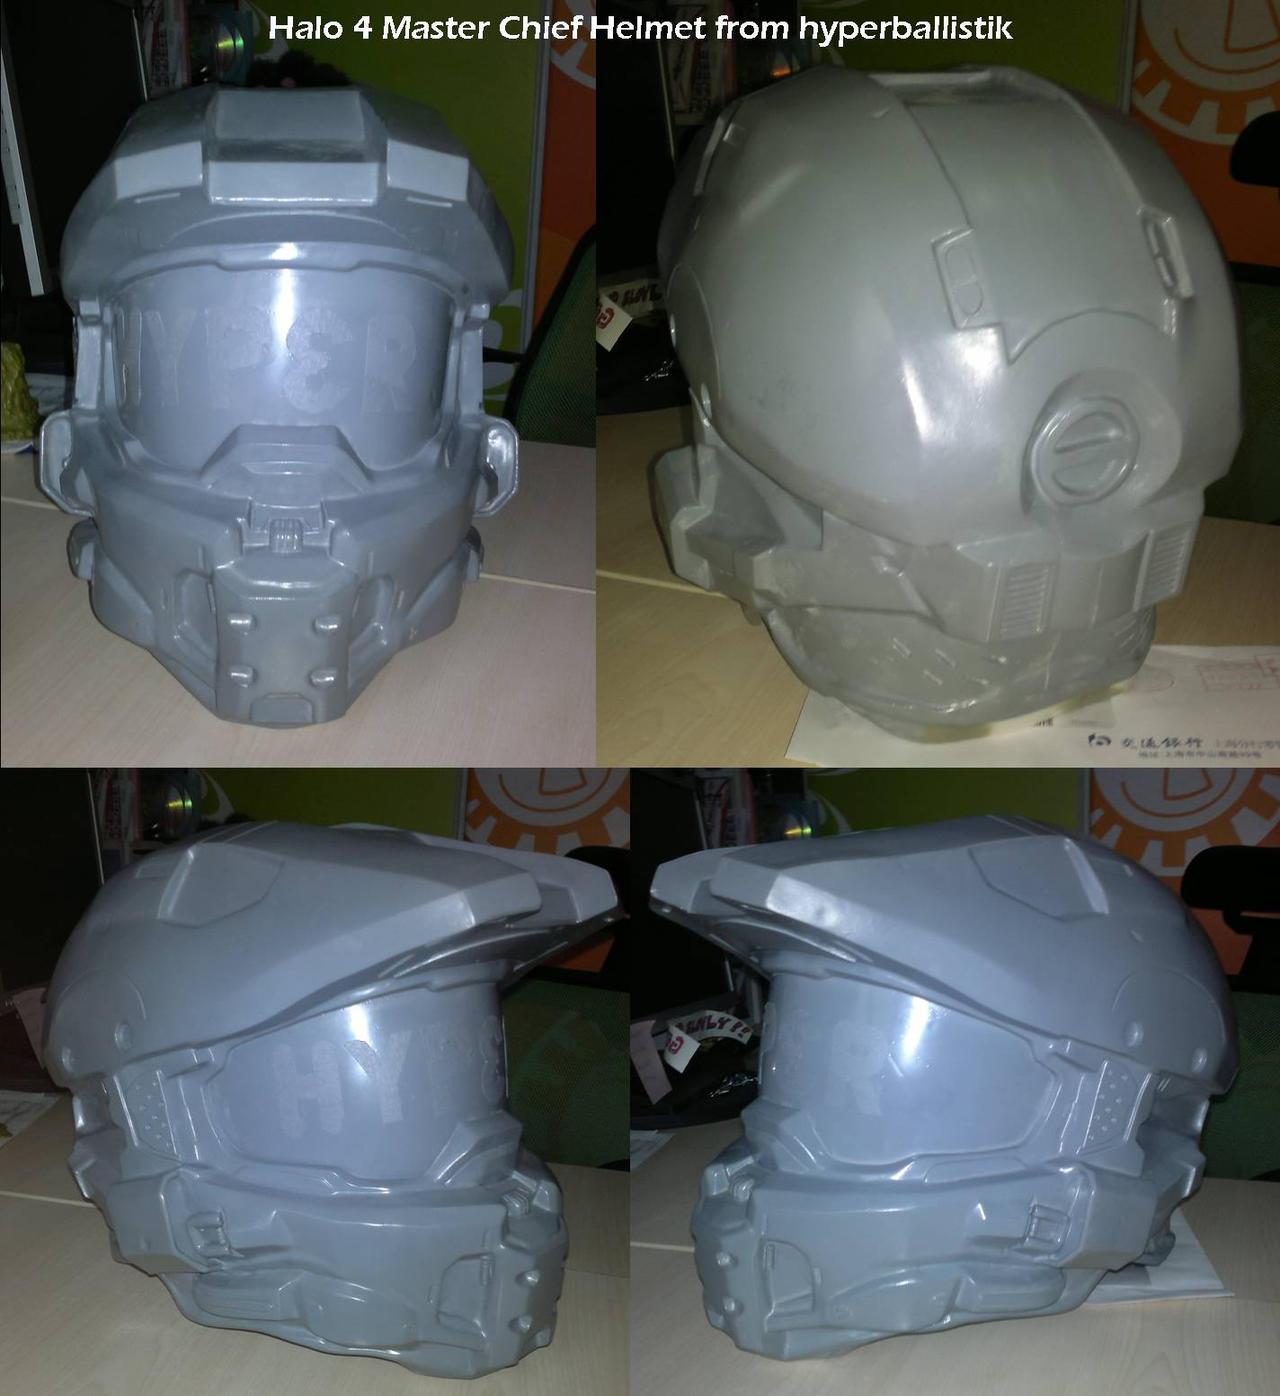 Masterchief helmet from hyperballistik by uratz studios on - Uratz studios ...